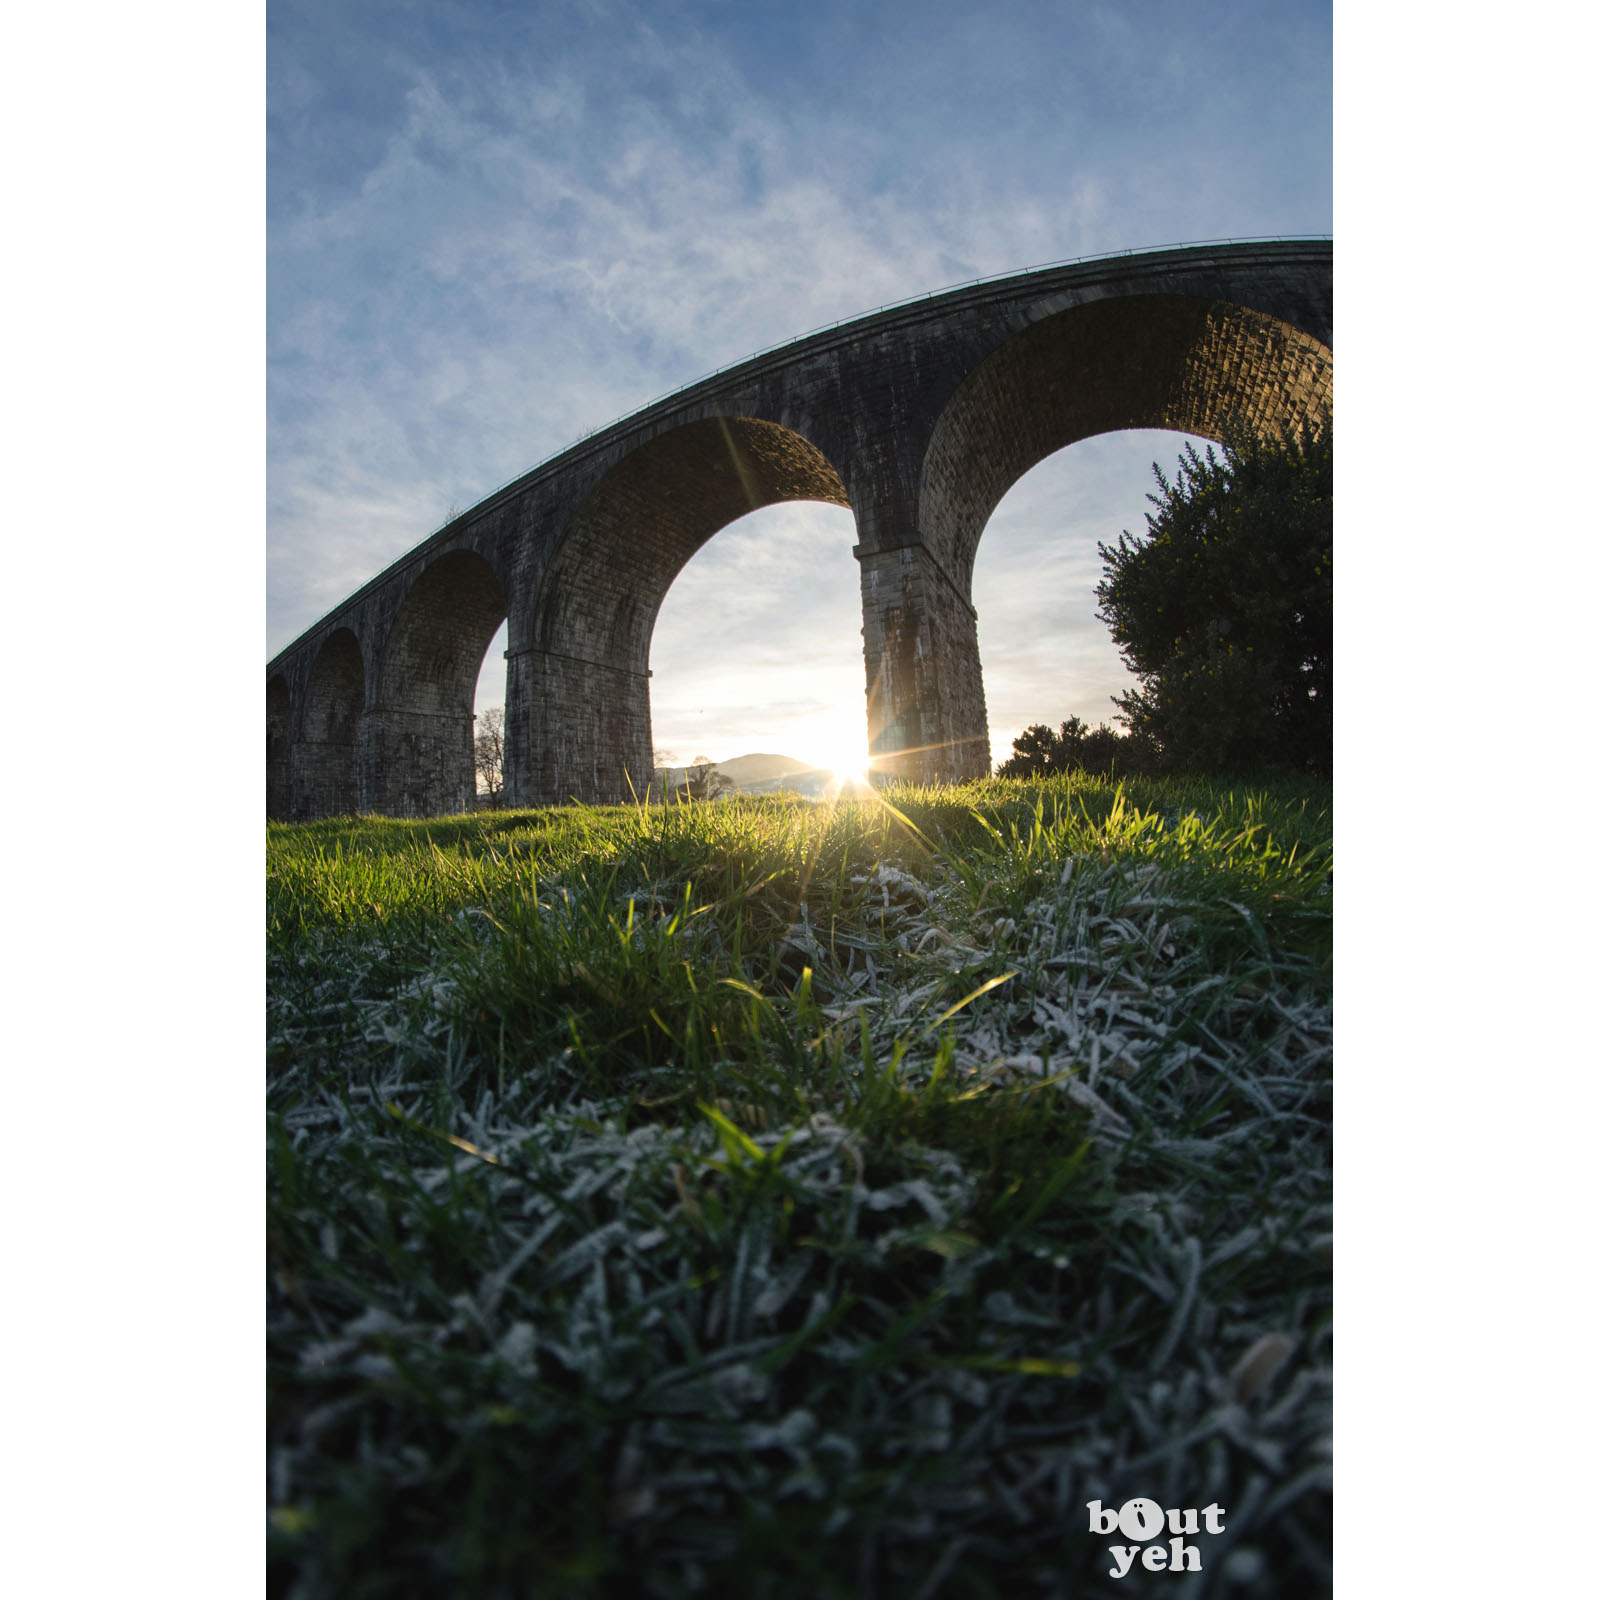 Craigmore Viaduct, Northern Ireland - photographic print for sale.